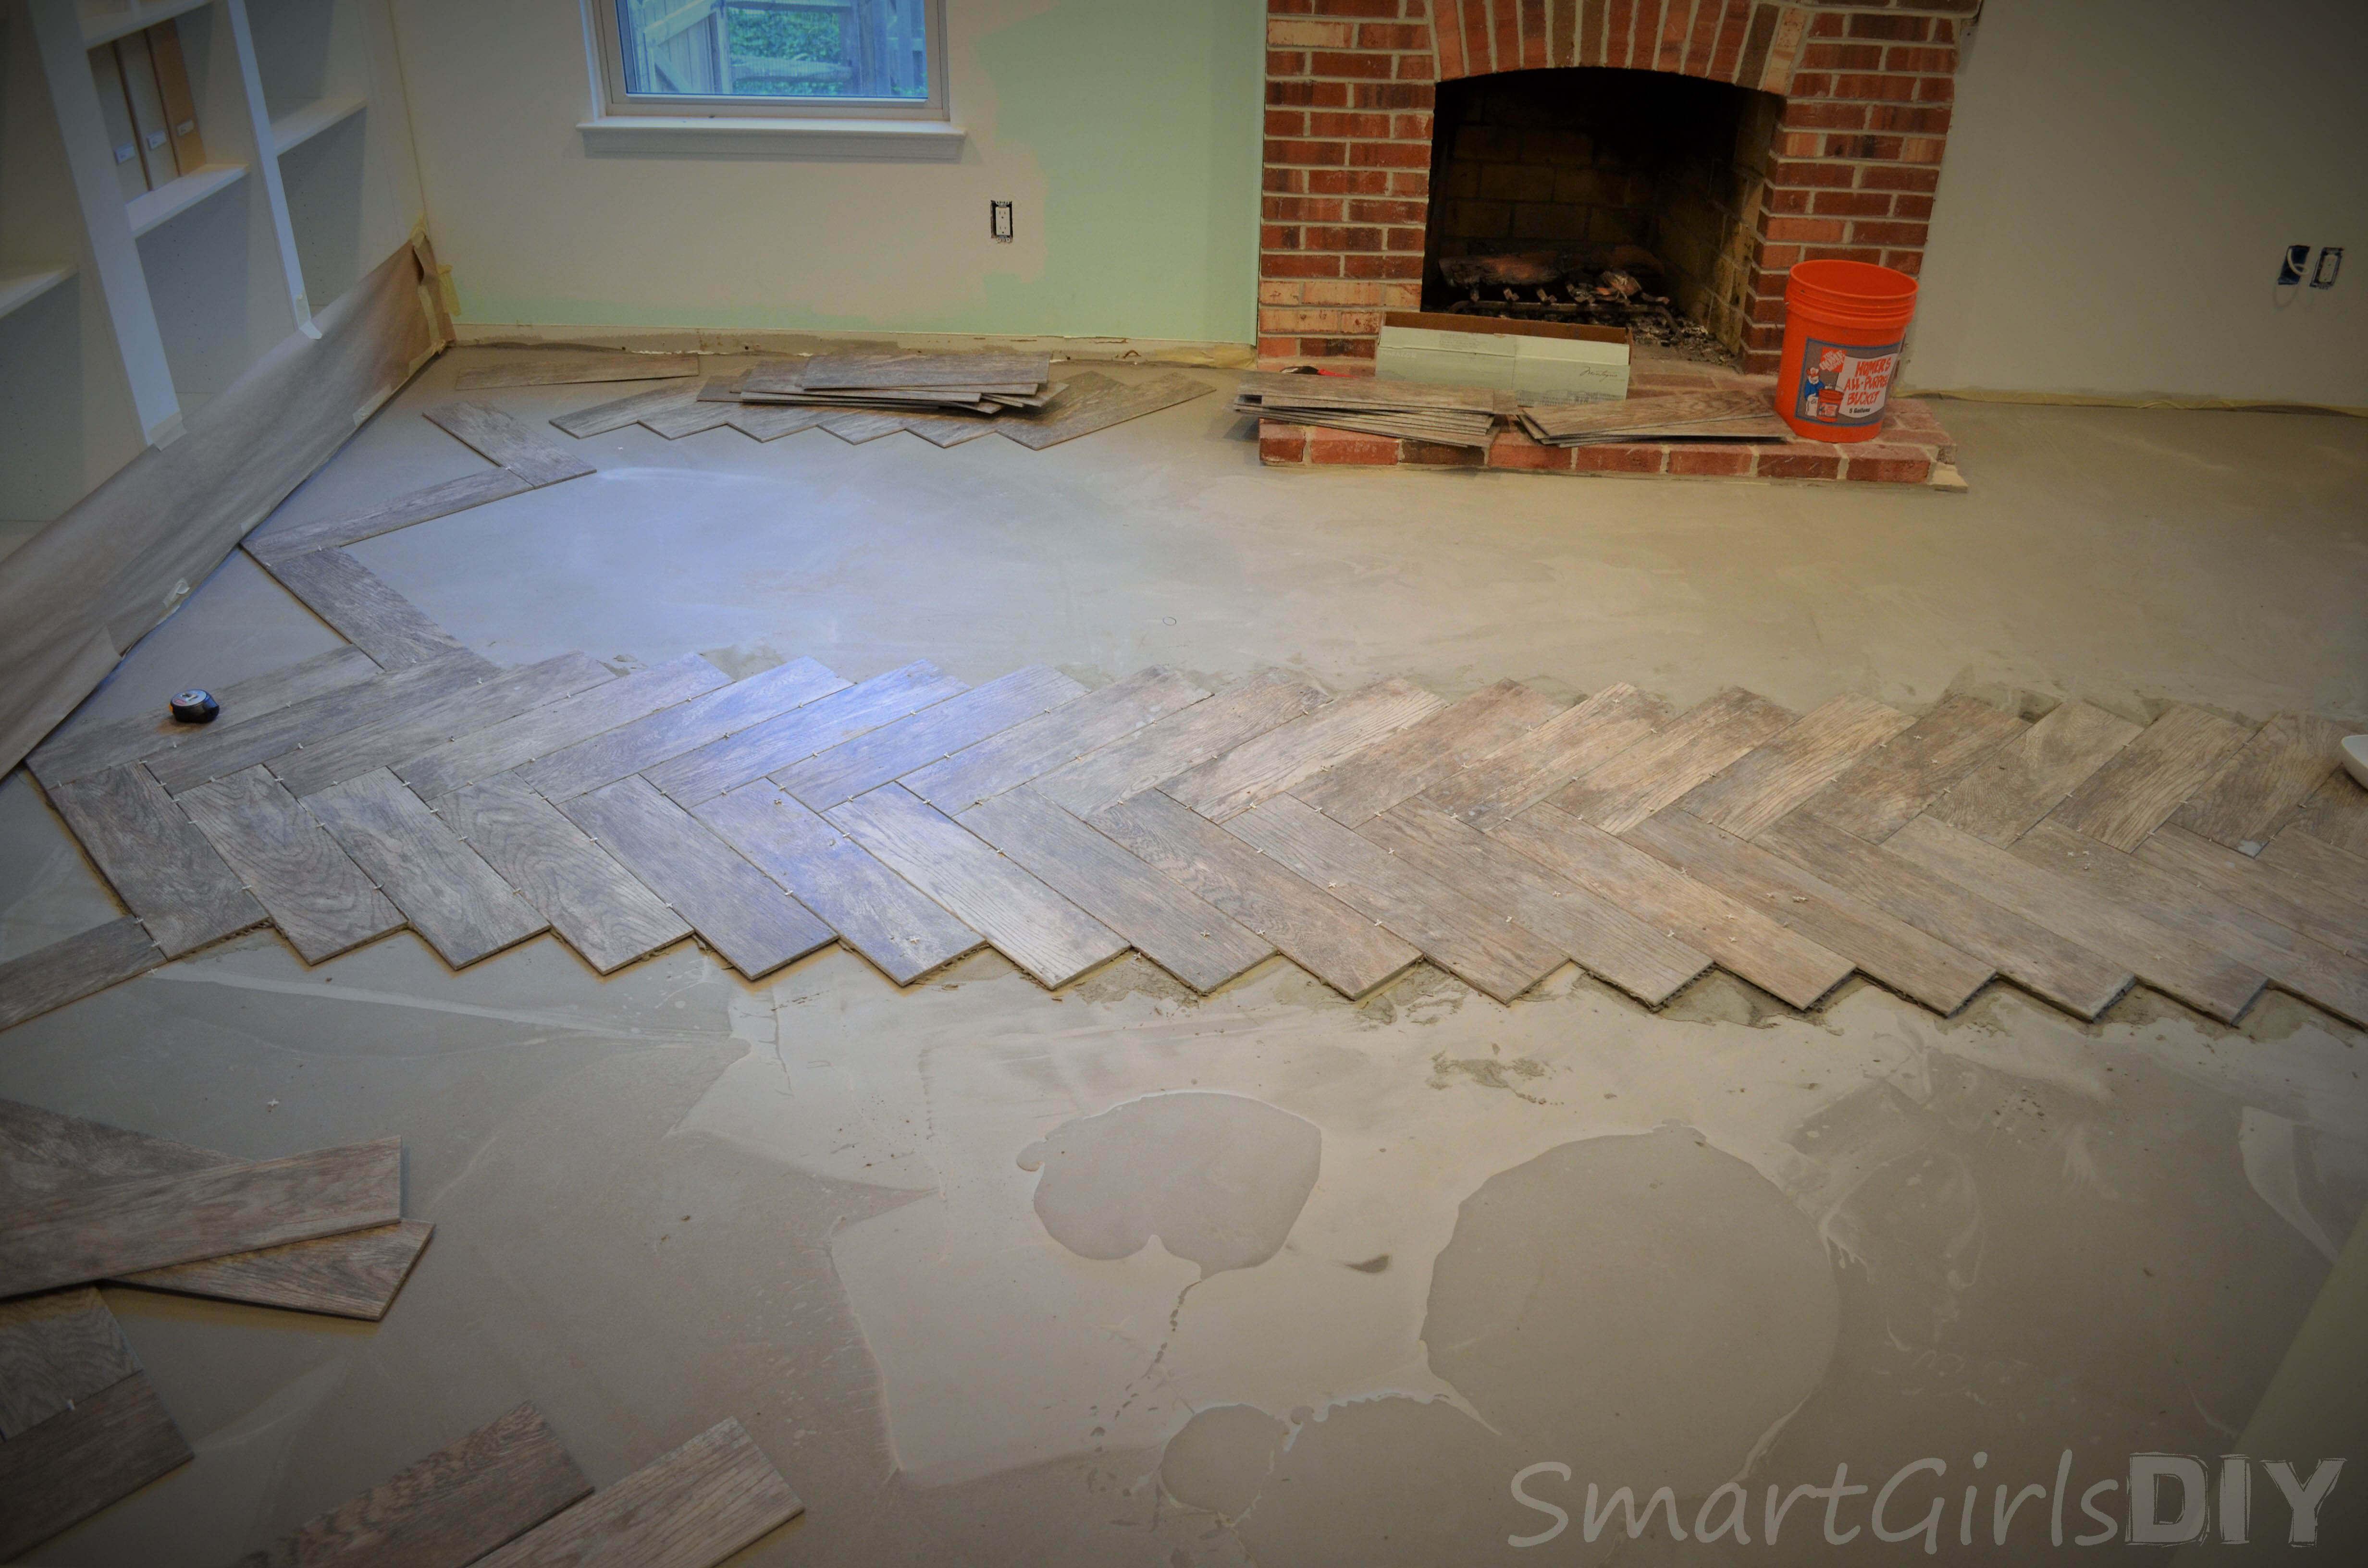 Diy Tile Floor image credit mary wiseman design First Row Of Herringbone Tile Finished